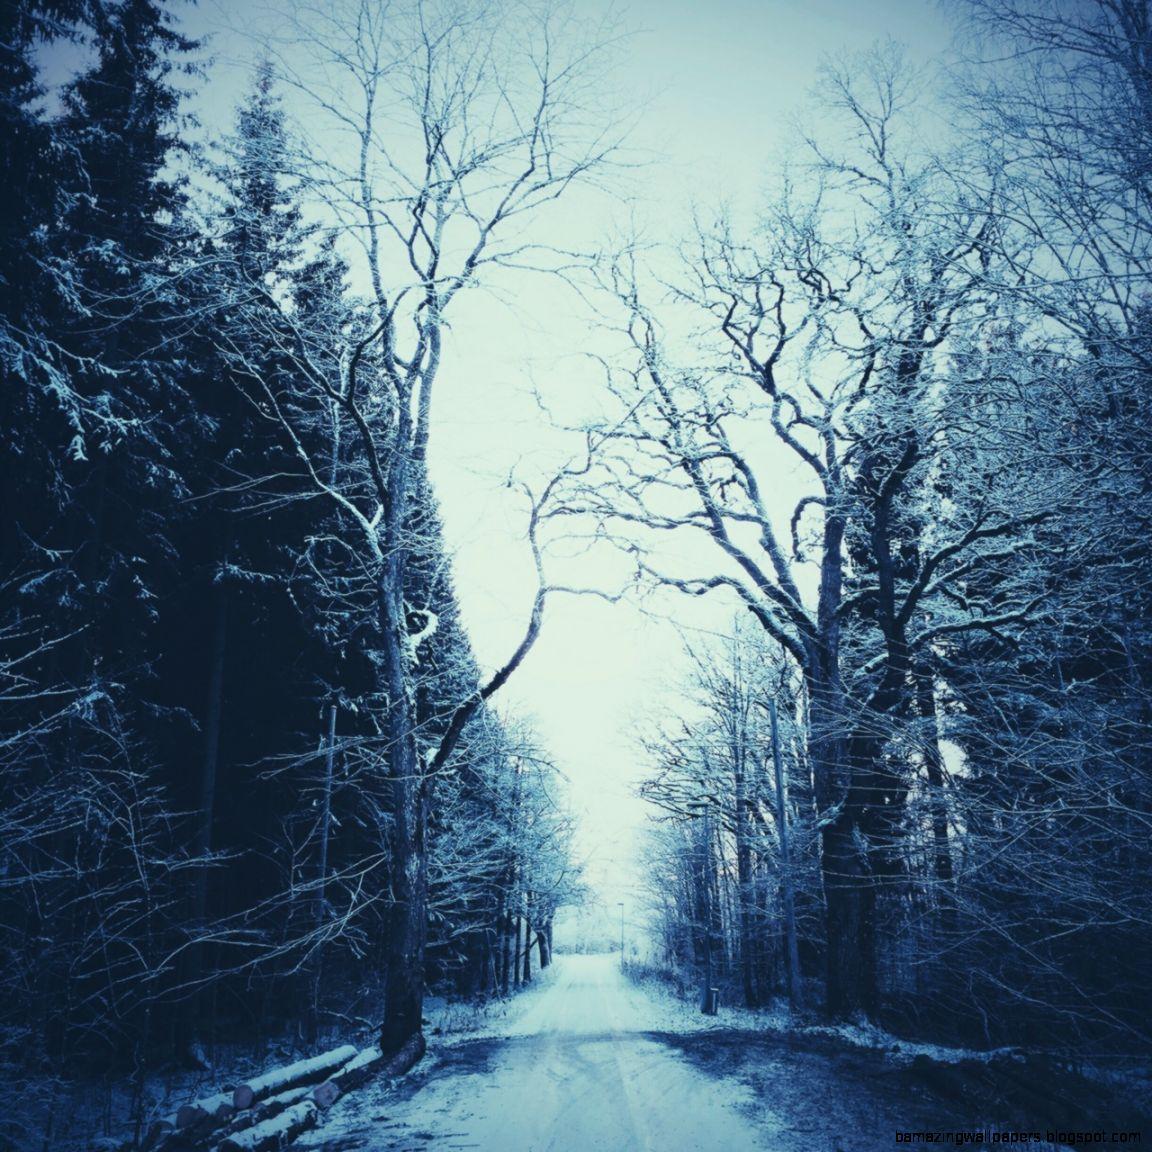 Joel Ericsson Photography — Winter is here ❄️